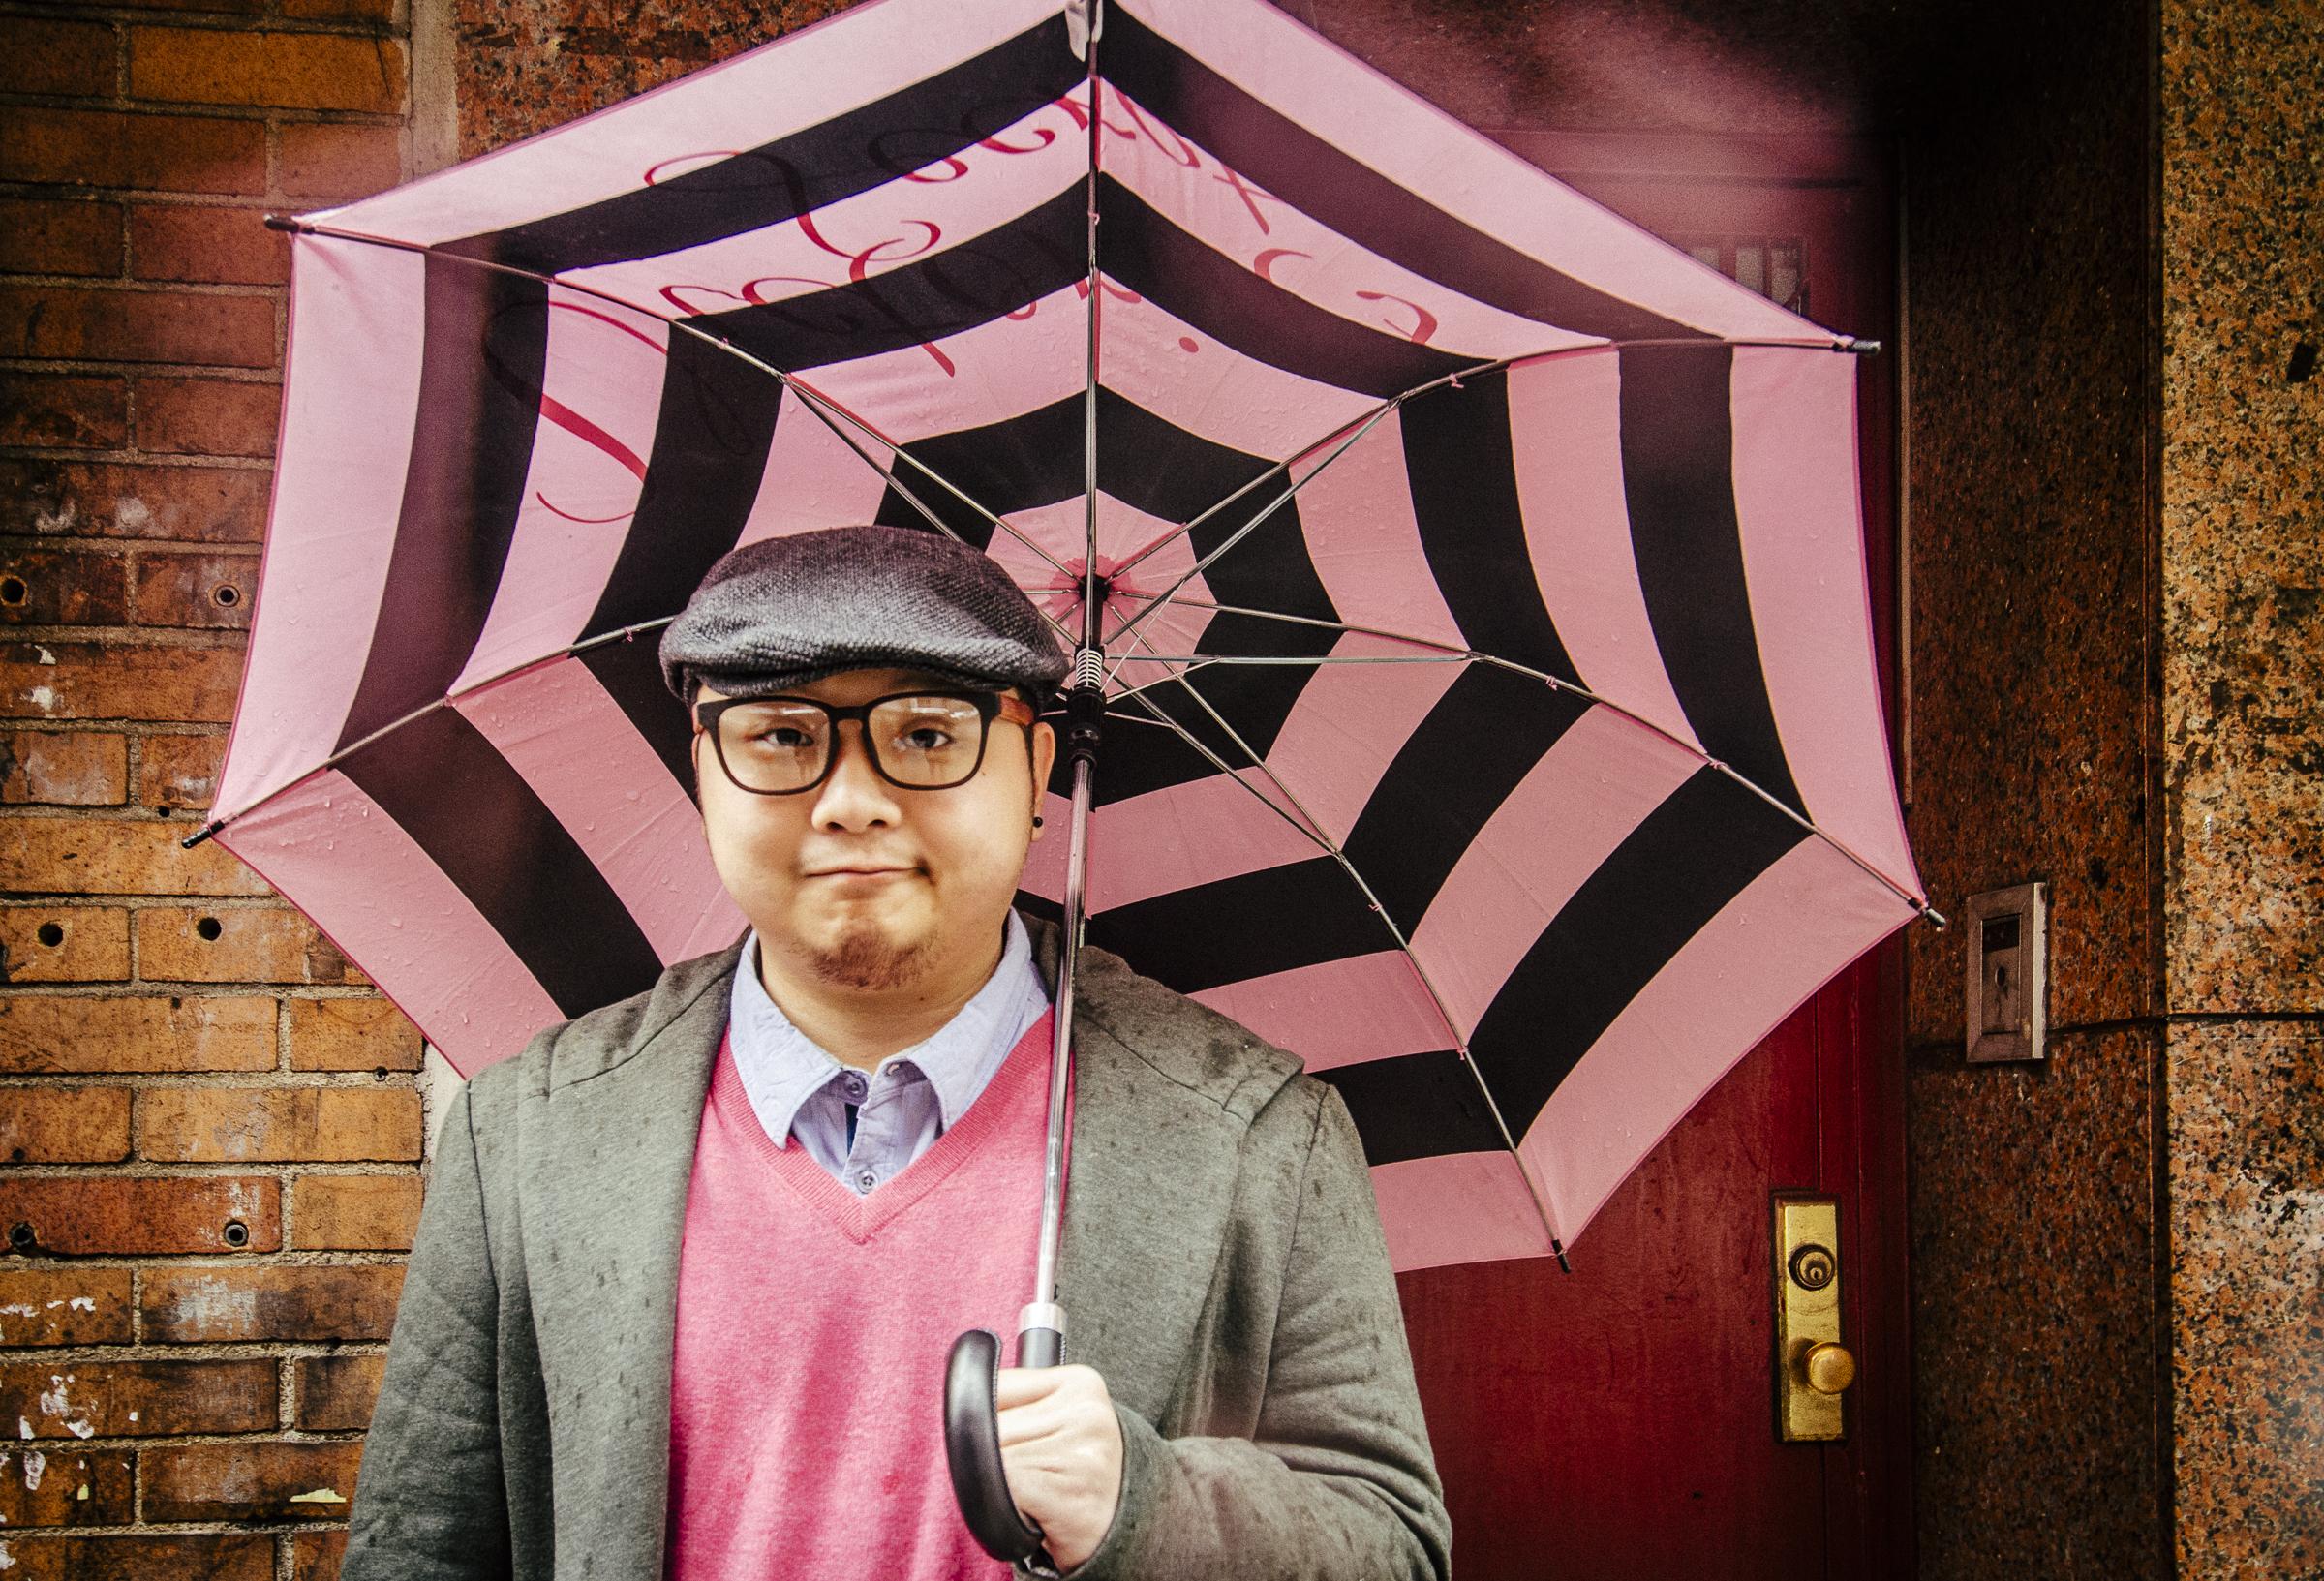 Mr. Kim. Chinatown, NY 2014 © Celine Gil NYC SALT